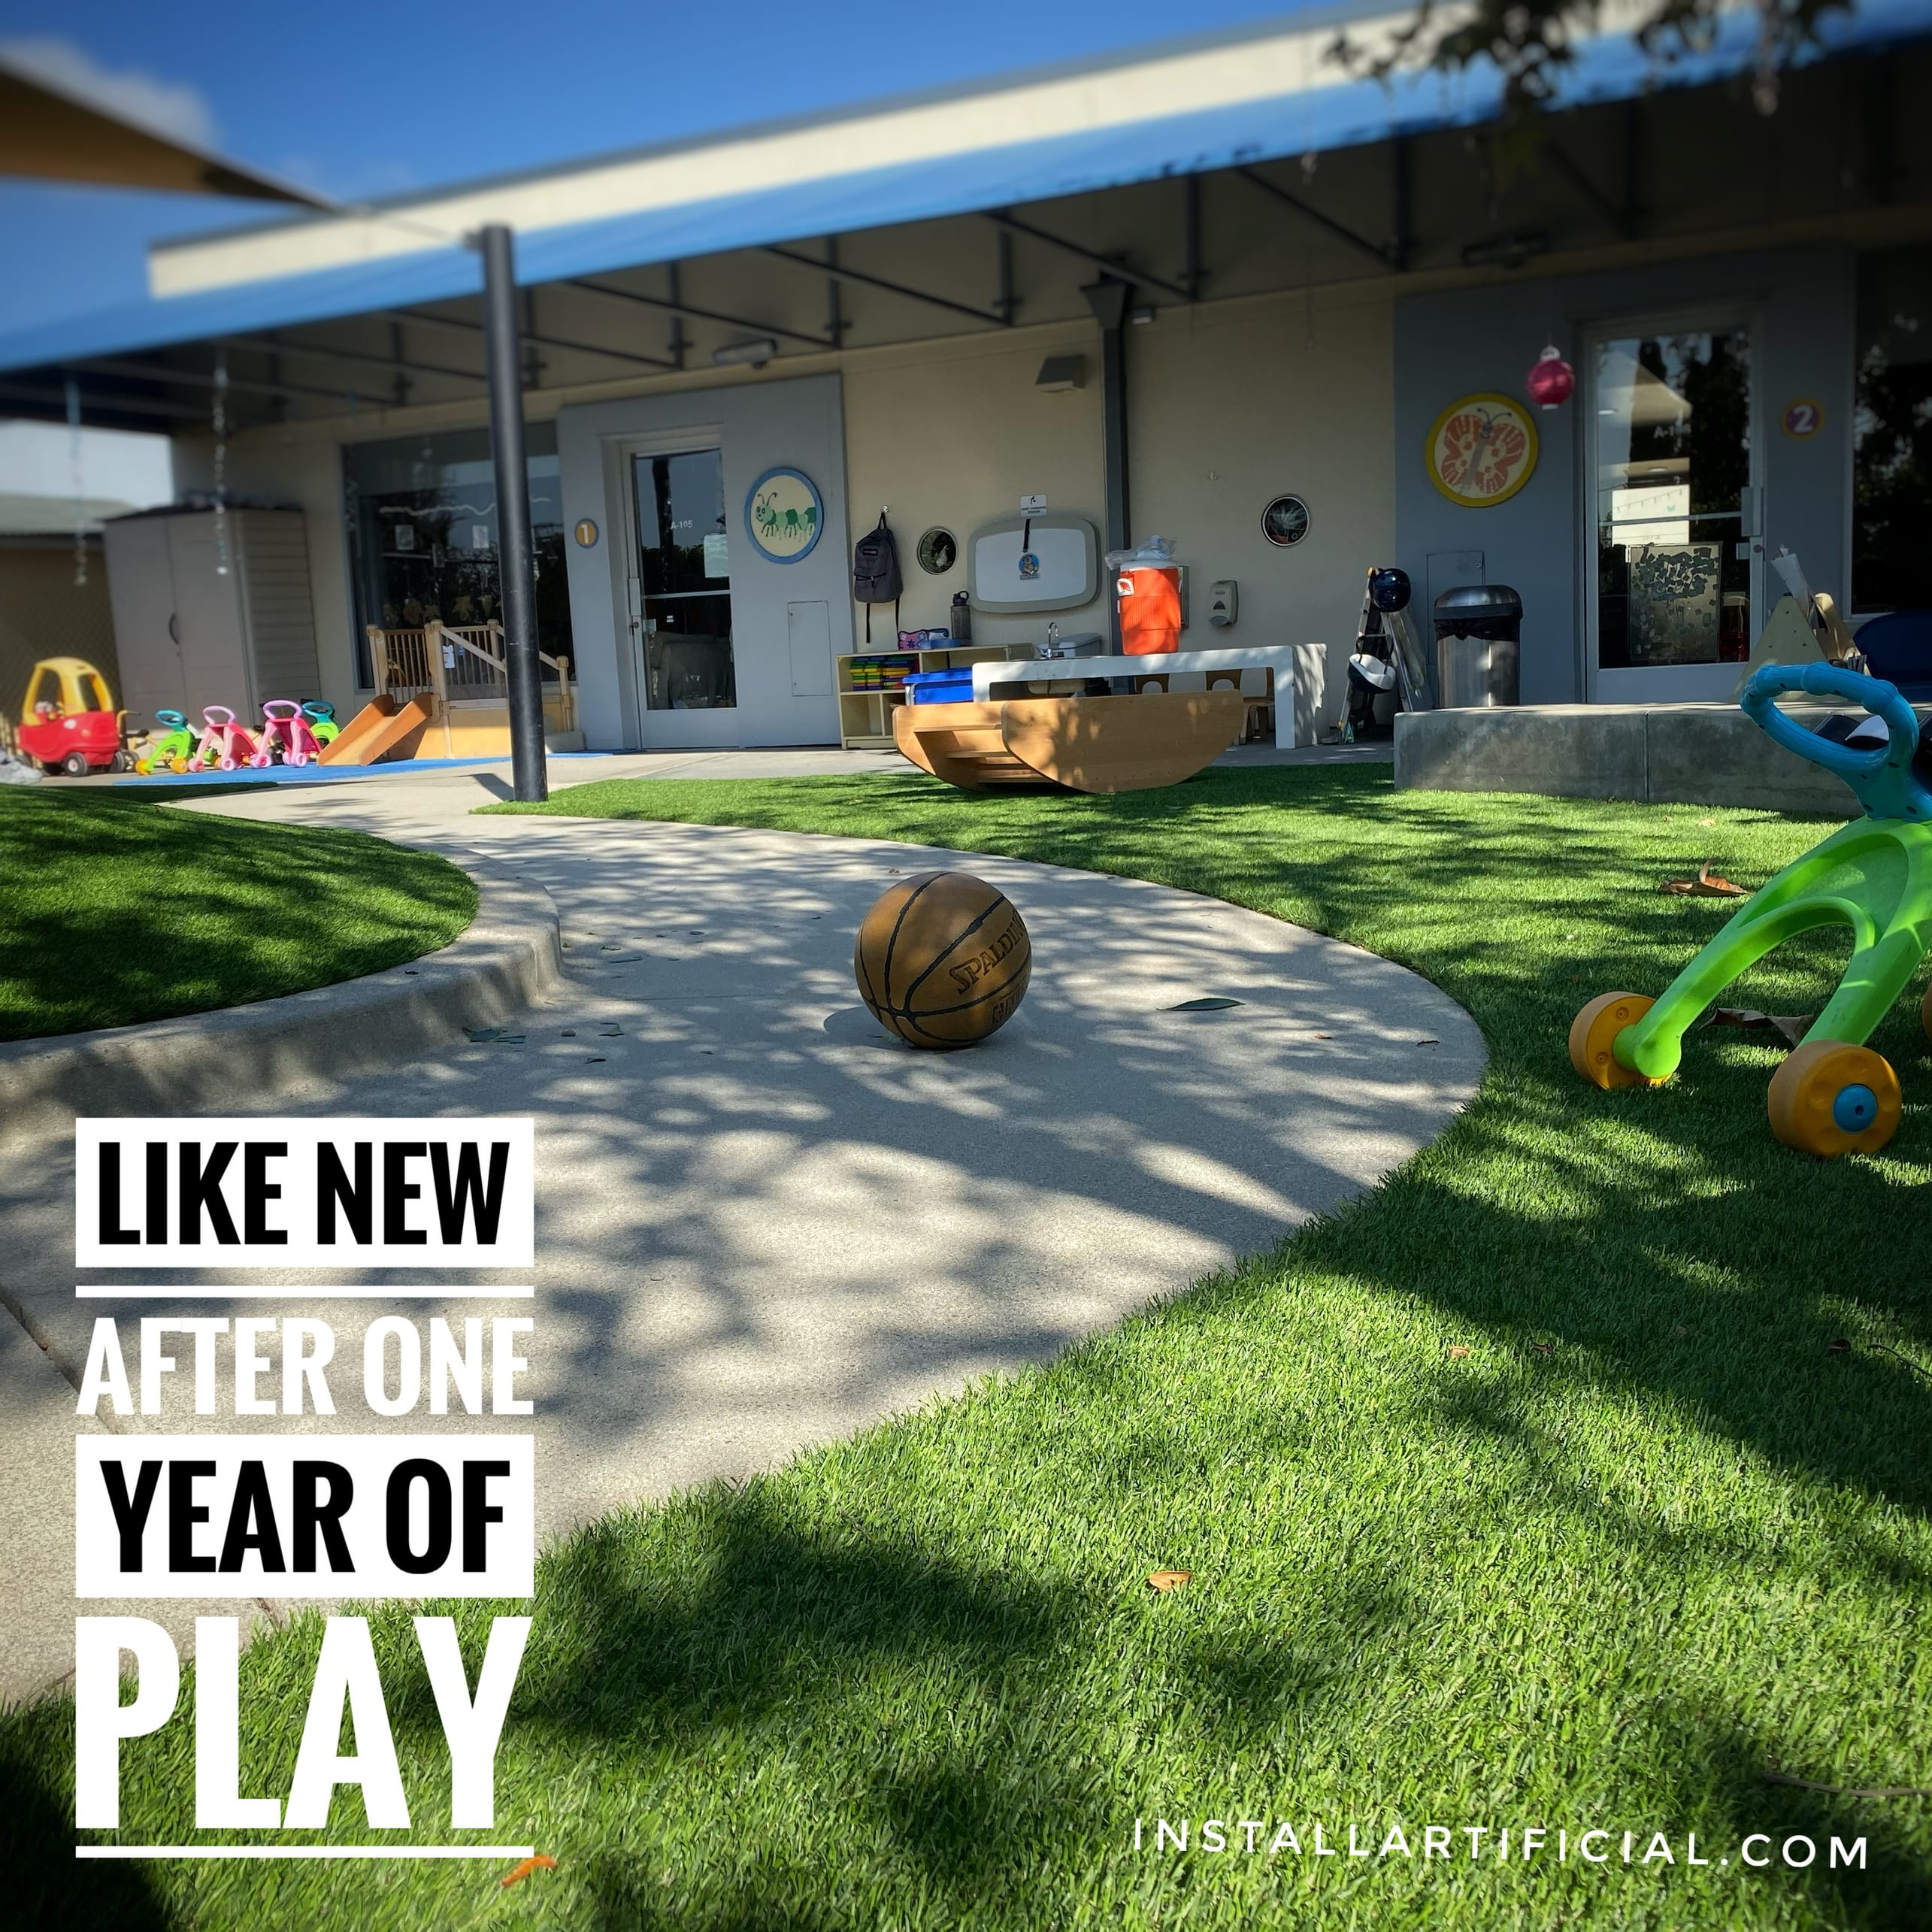 Safe nail free Playground system